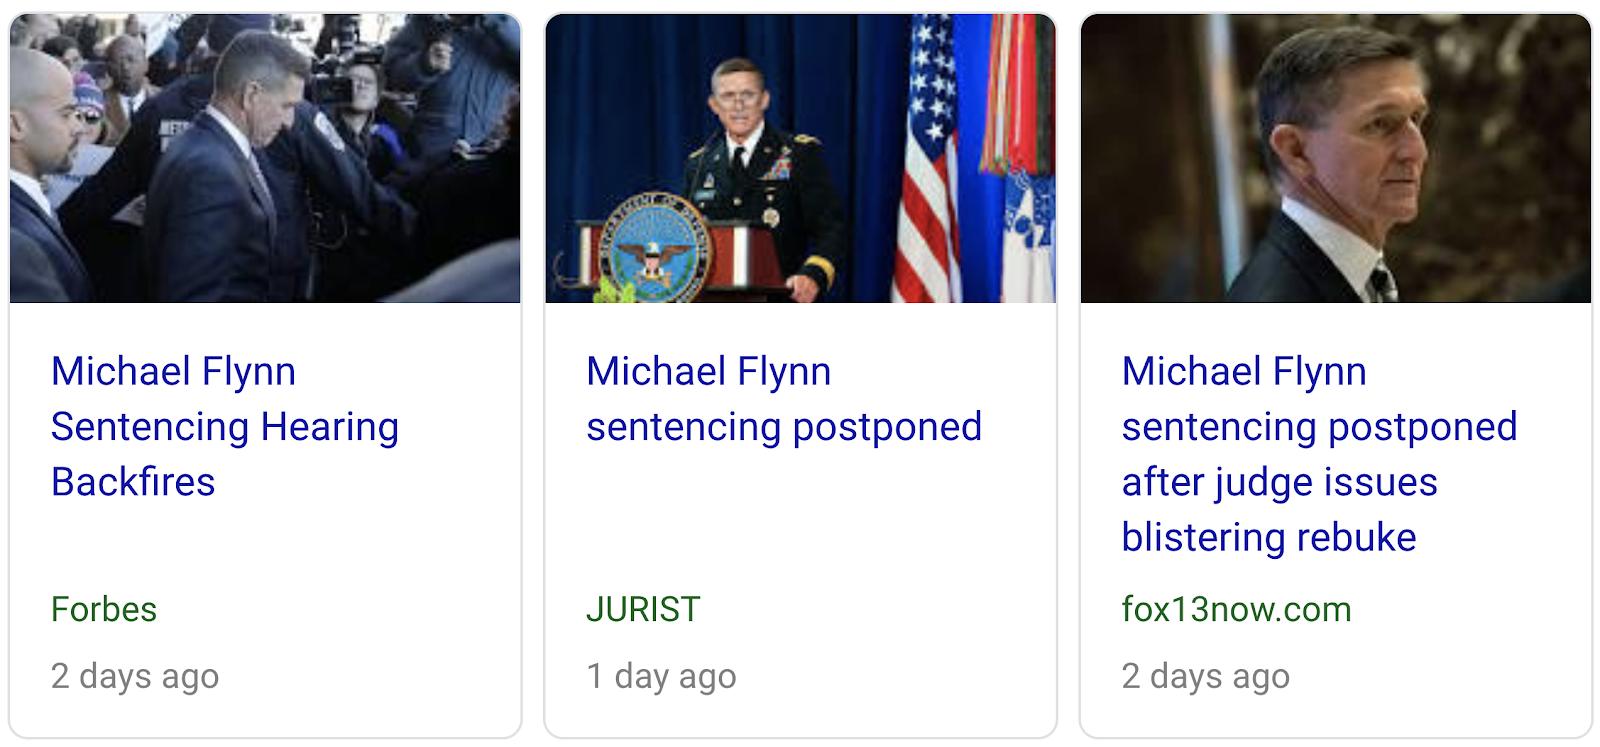 0fd0df640 https://www.forbes.com/sites/walterpavlo/2018/12/18/michael-flynn -sentencing-hearing-backfires/#33e56af31f81